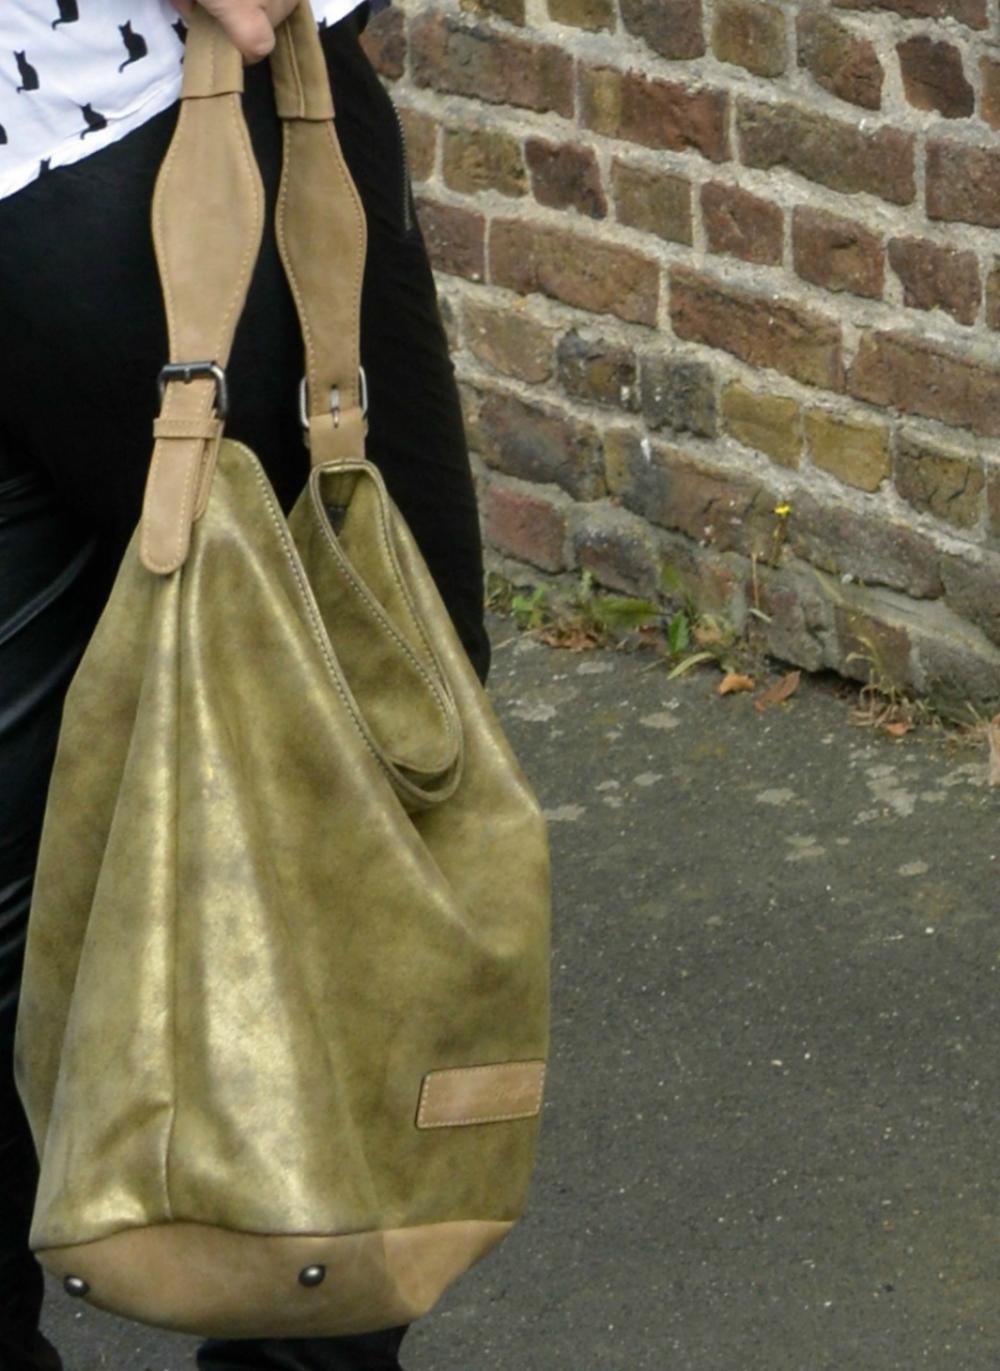 Close up of the FRITZI AUS PREUßEN Hobo bag